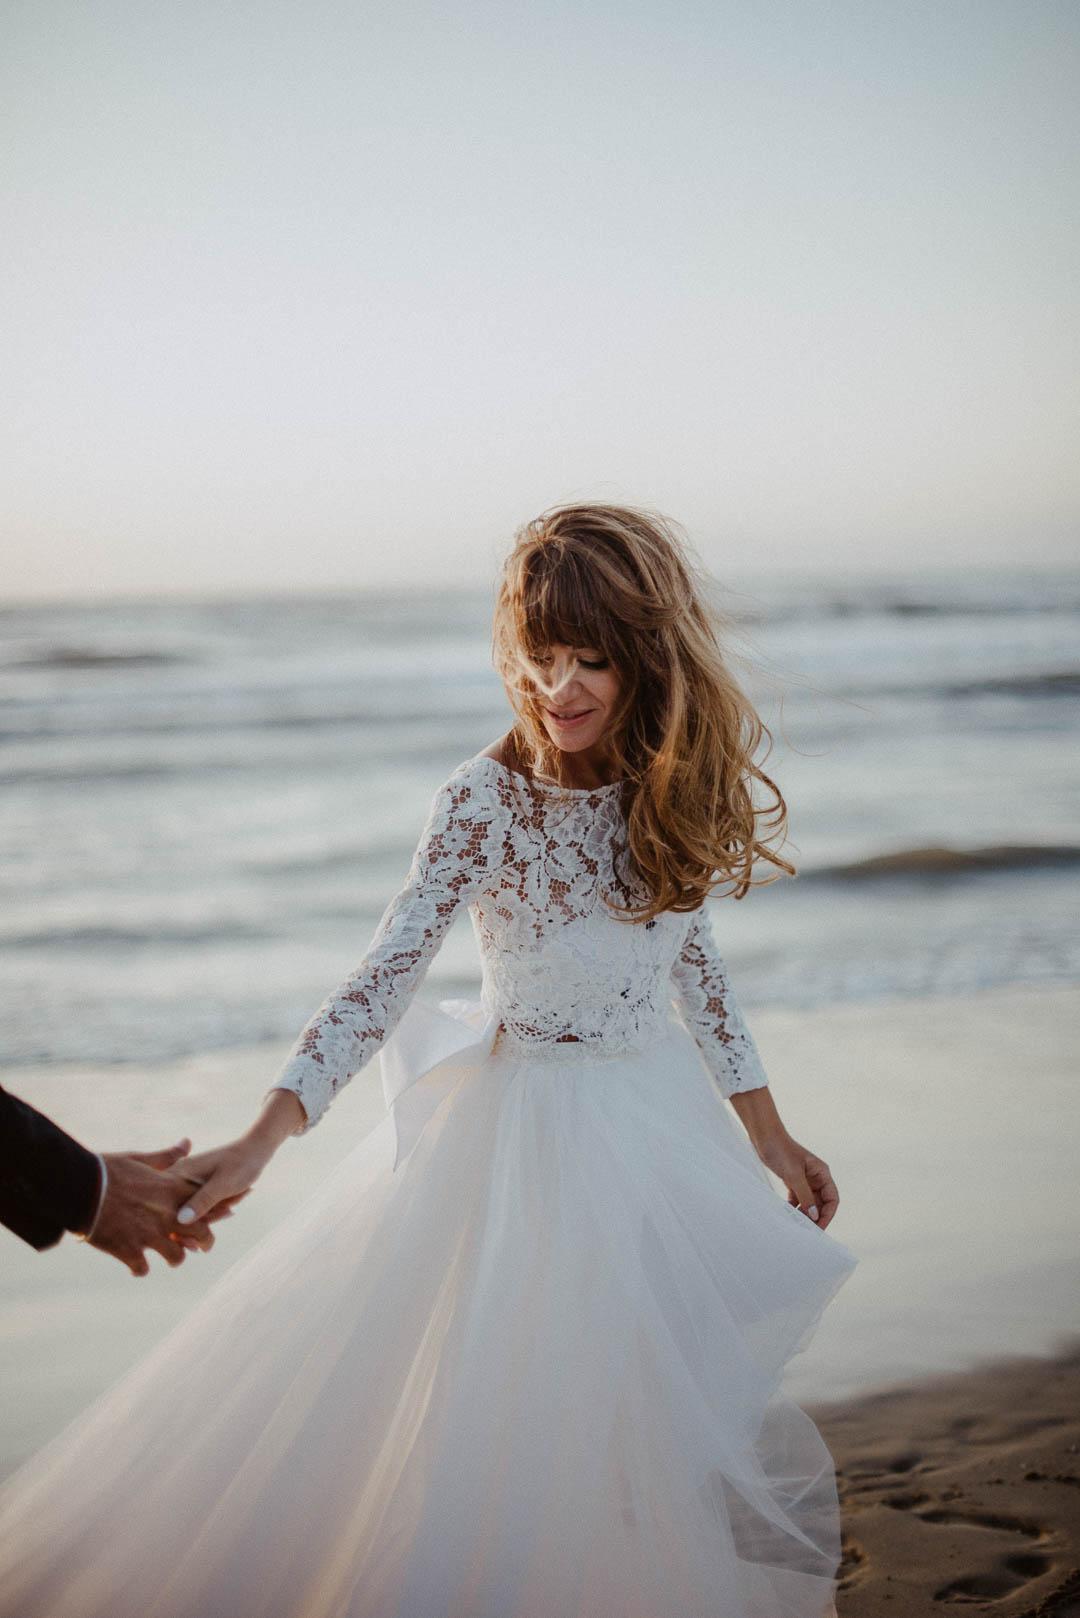 wedding-photographer-destination-fineart-bespoke-reportage-napoli-nabilah-vivianeizzo-spazio46-127